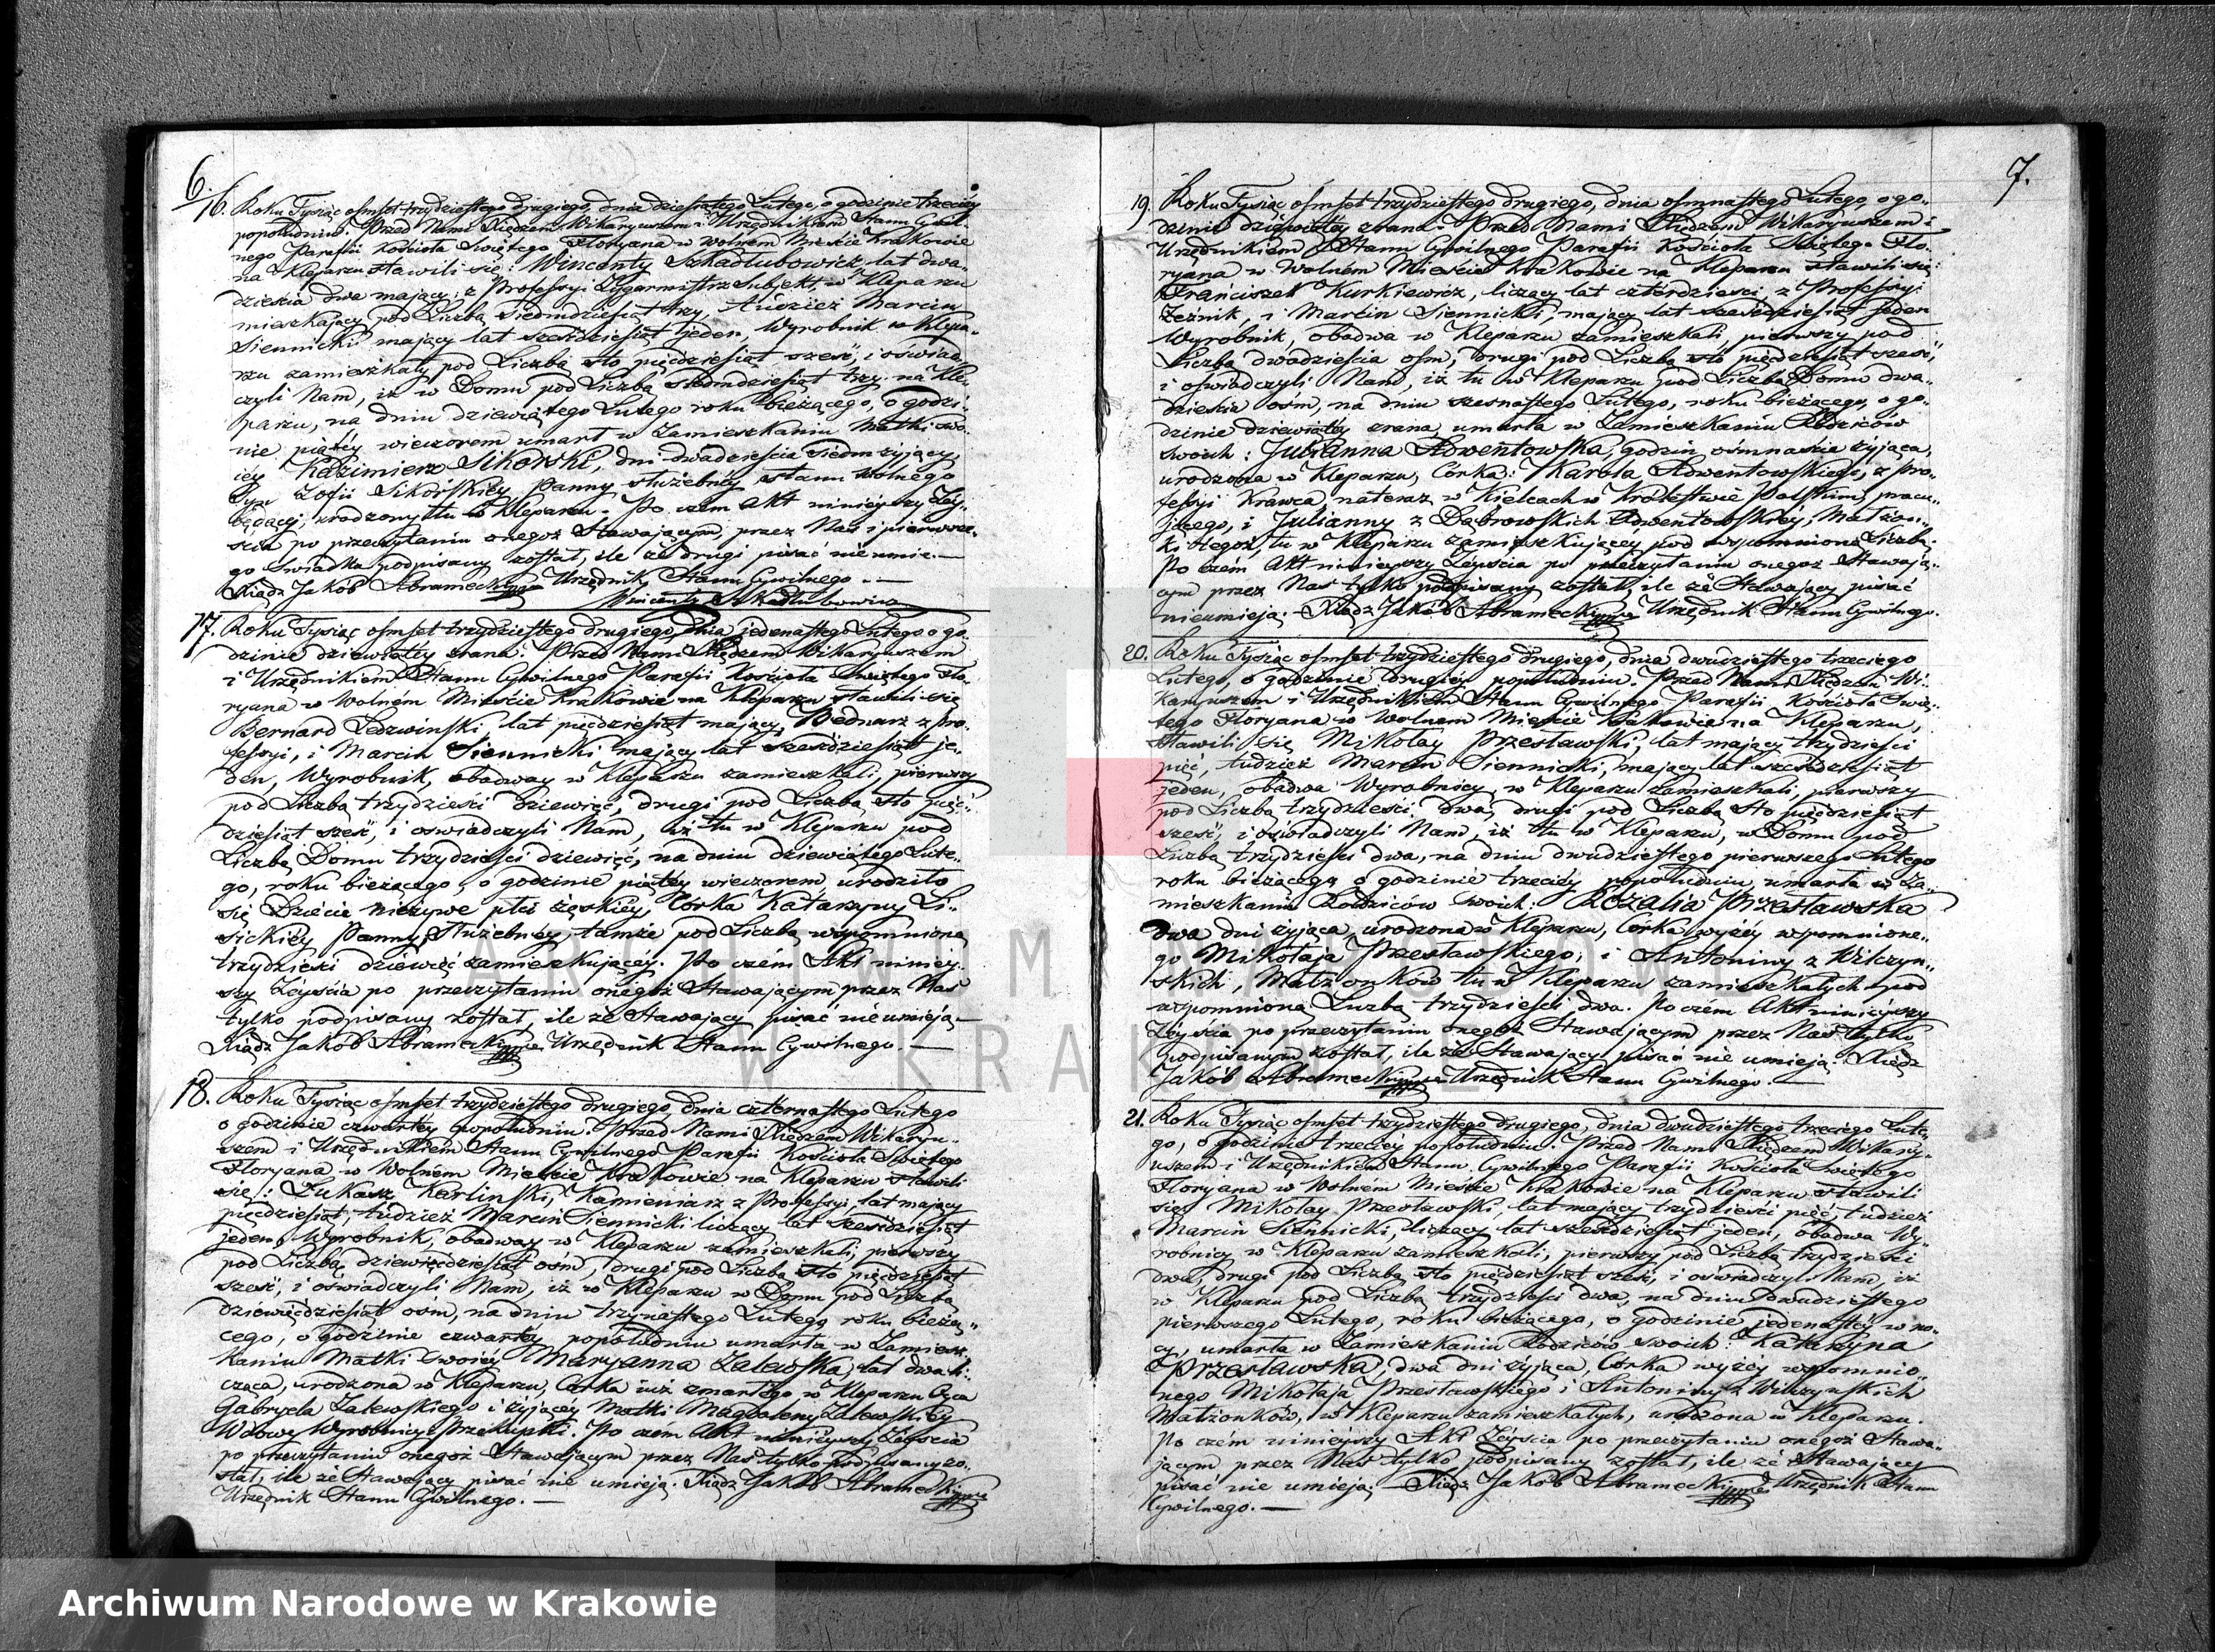 Skan z jednostki: Księga Aktów Zeyścia dla Parafii Sgo Floryana na Rok 1832gi […]